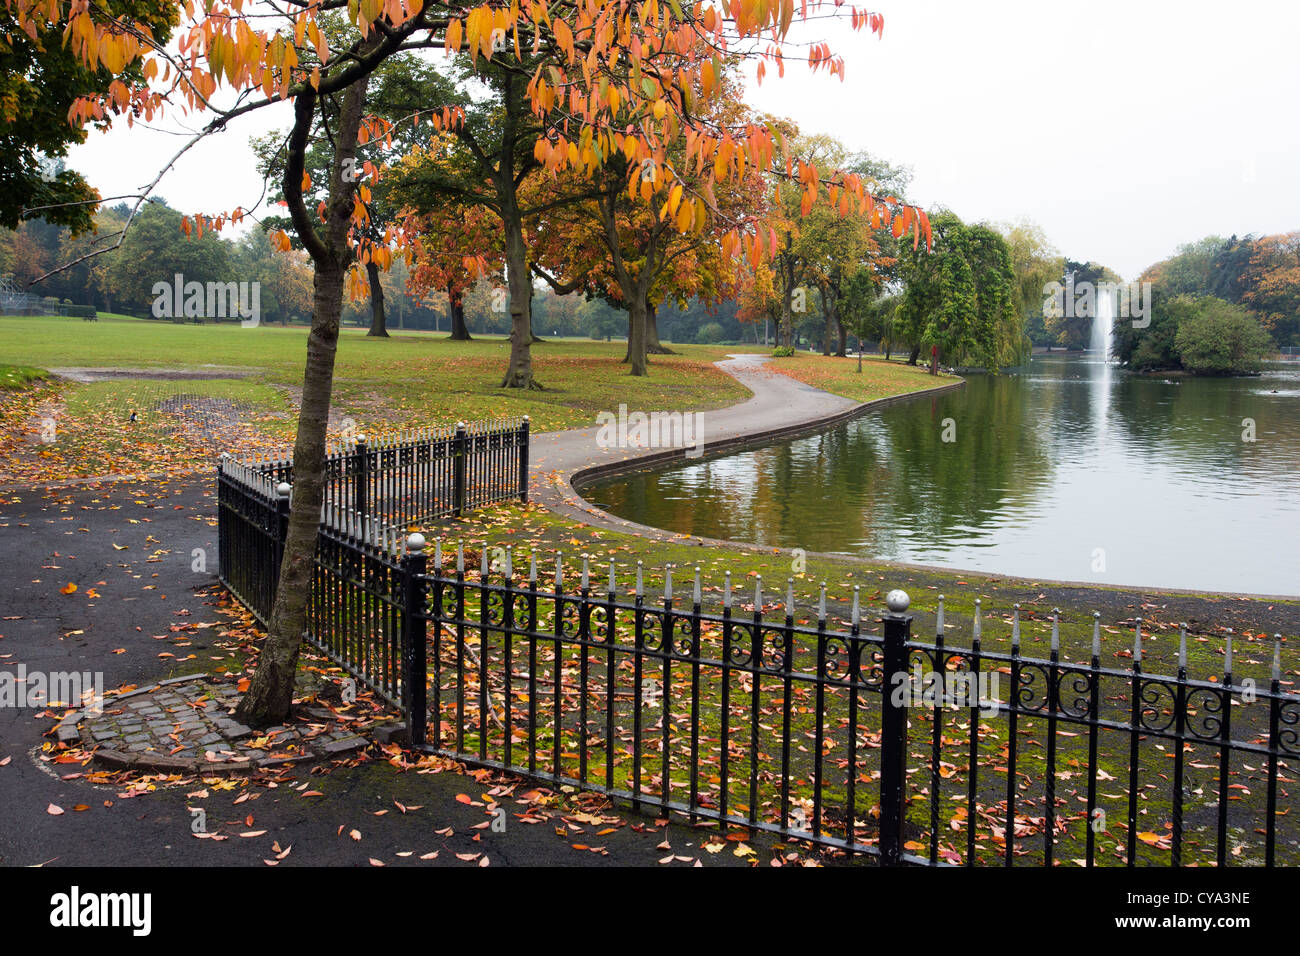 Winding Path Park Stock Photos & Winding Path Park Stock Images - Alamy